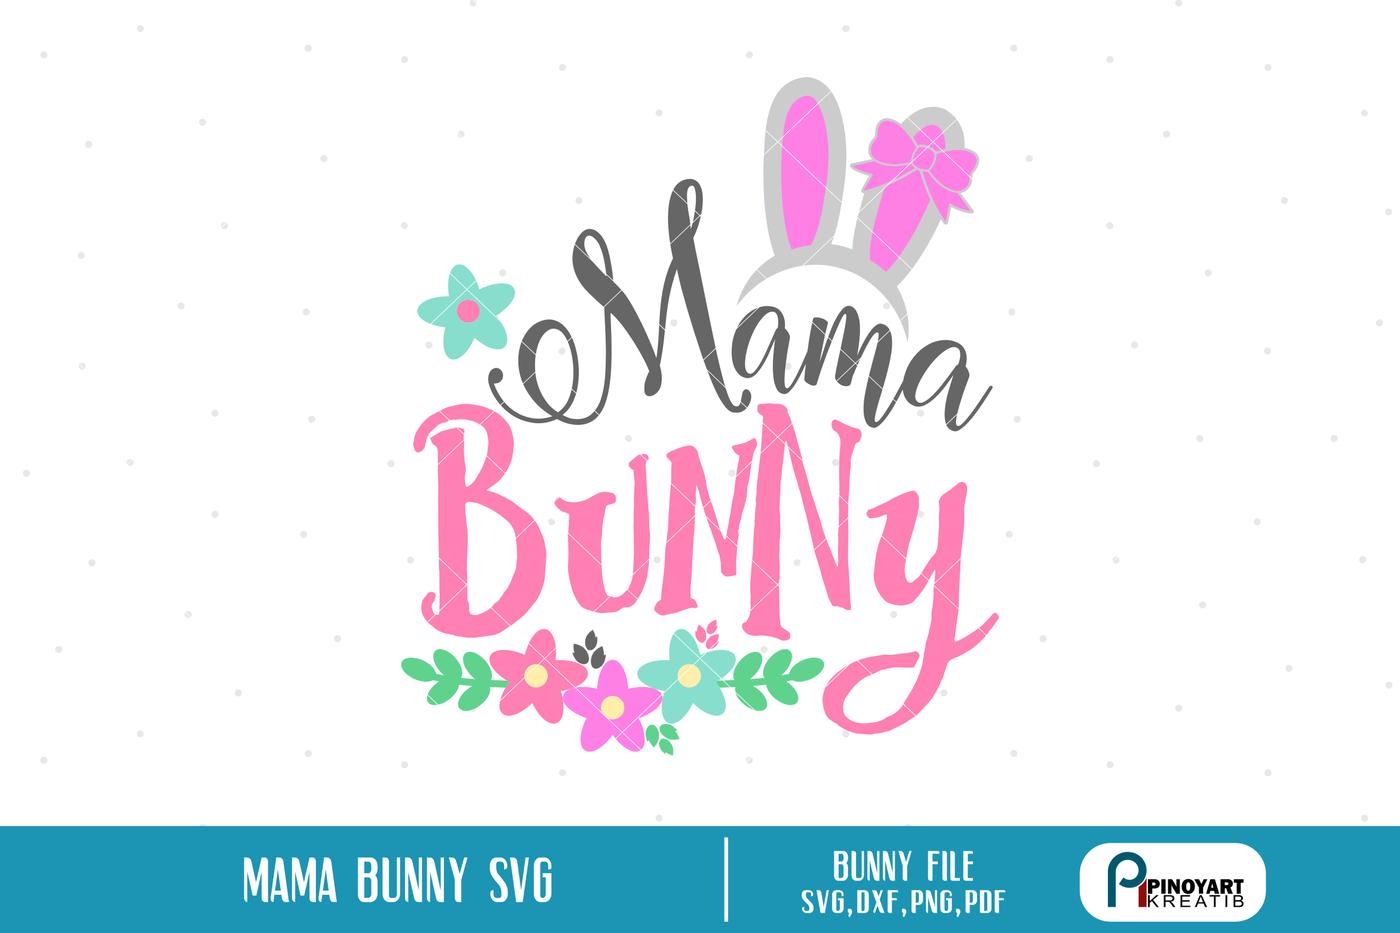 Bunny Svg Bunny Svg File Mama Bunny Svg Easter Bunny Svg Svg